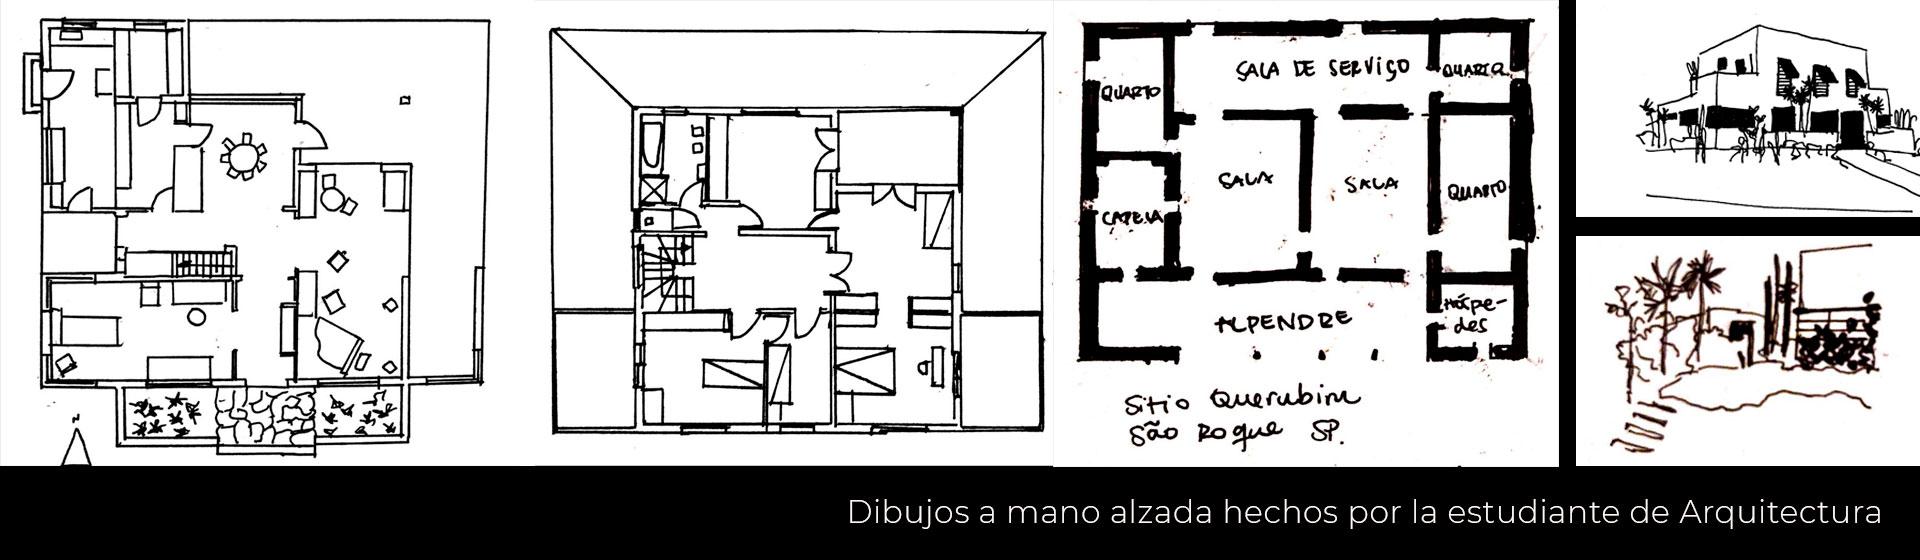 Dibujos de la casa Modernista de la Rua Santa Cruz